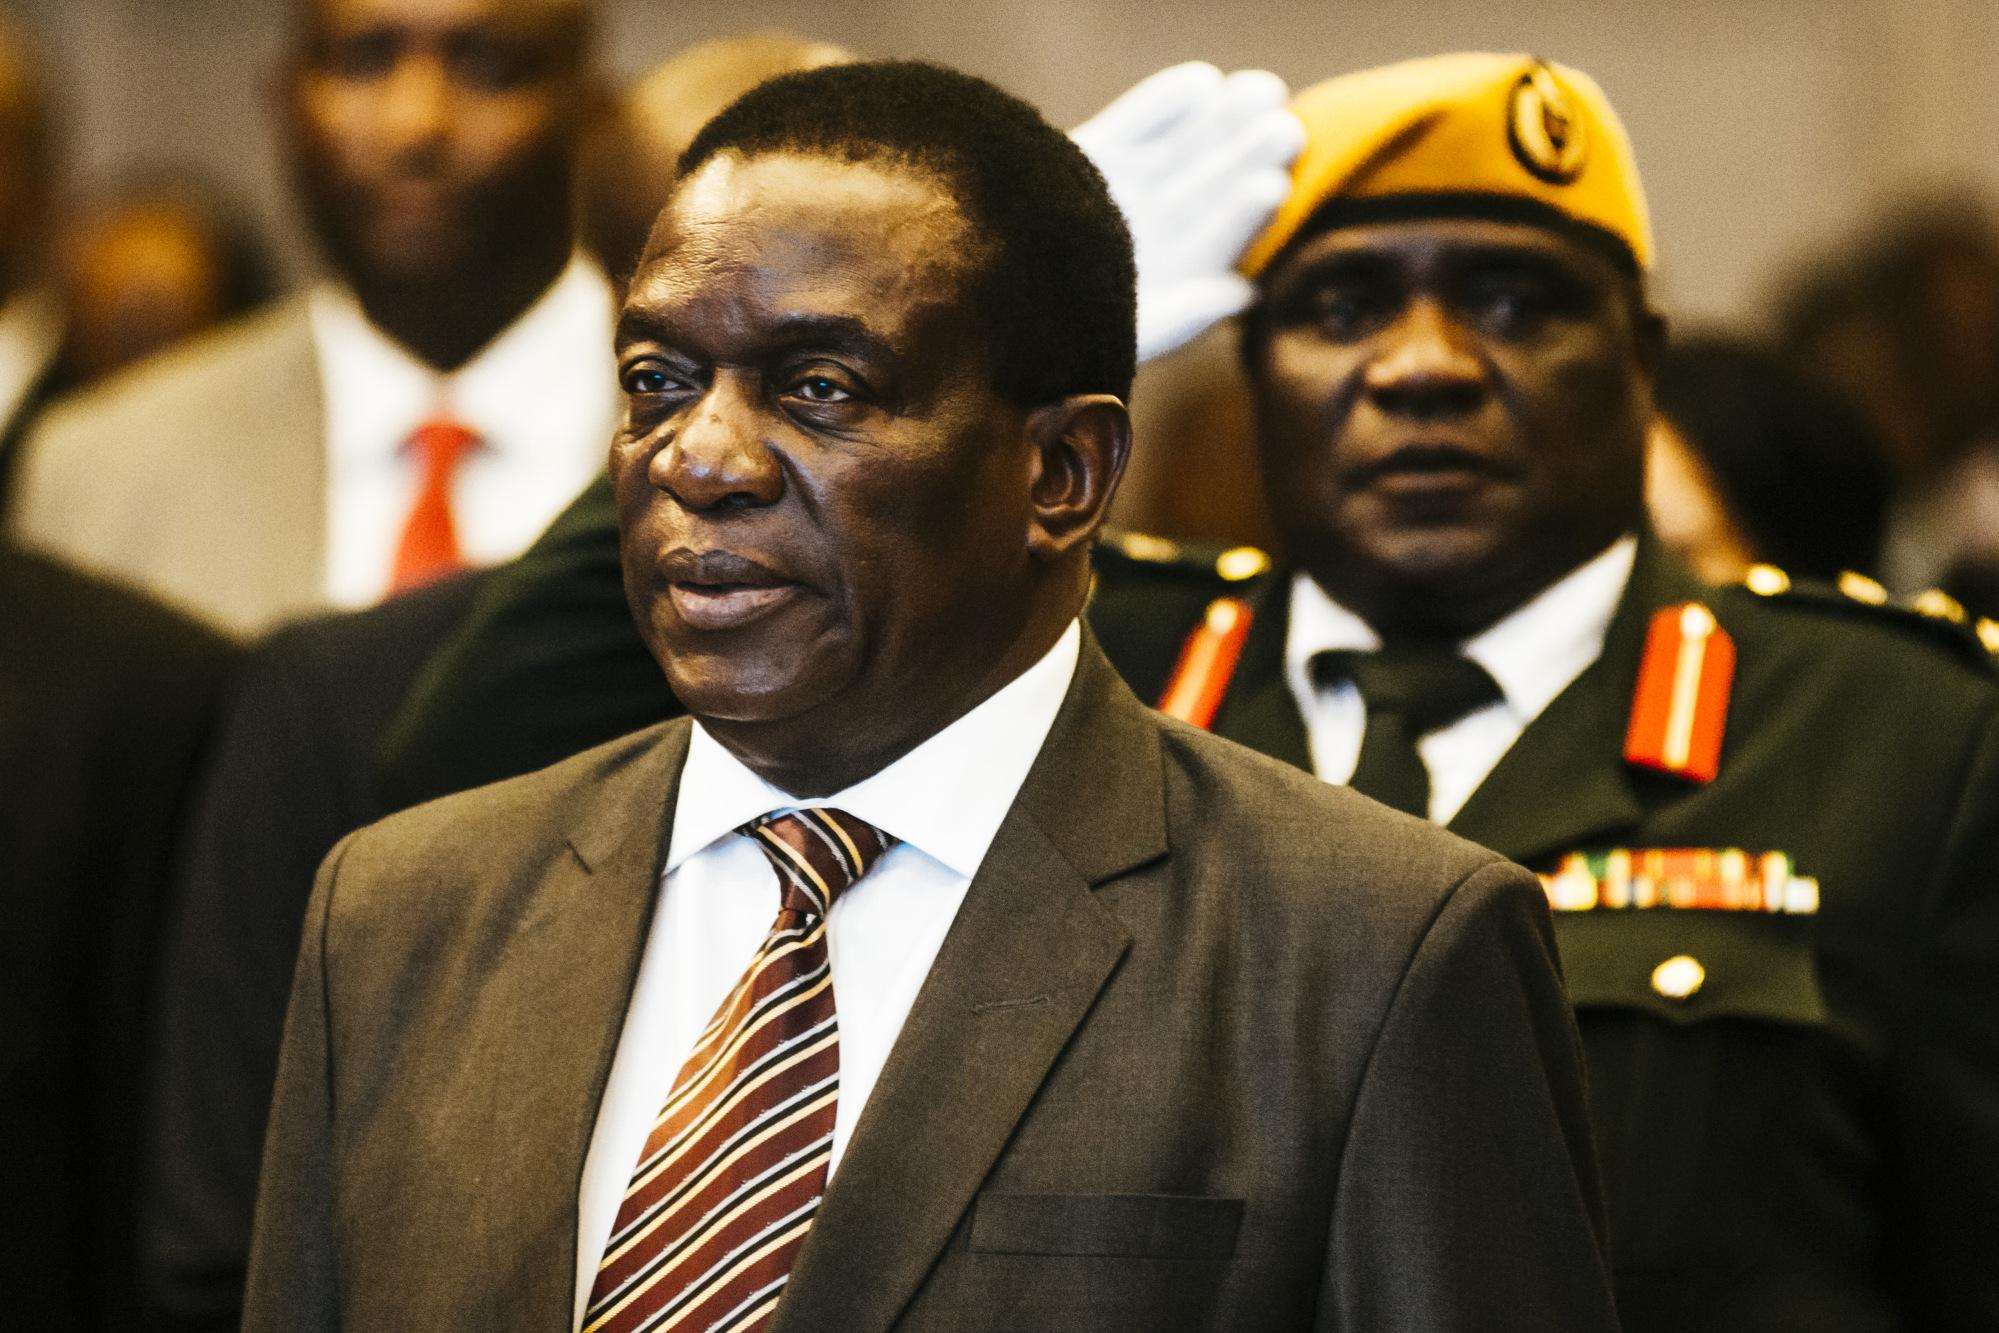 European Union Agrees to Send Election Observers to Zimbabwe